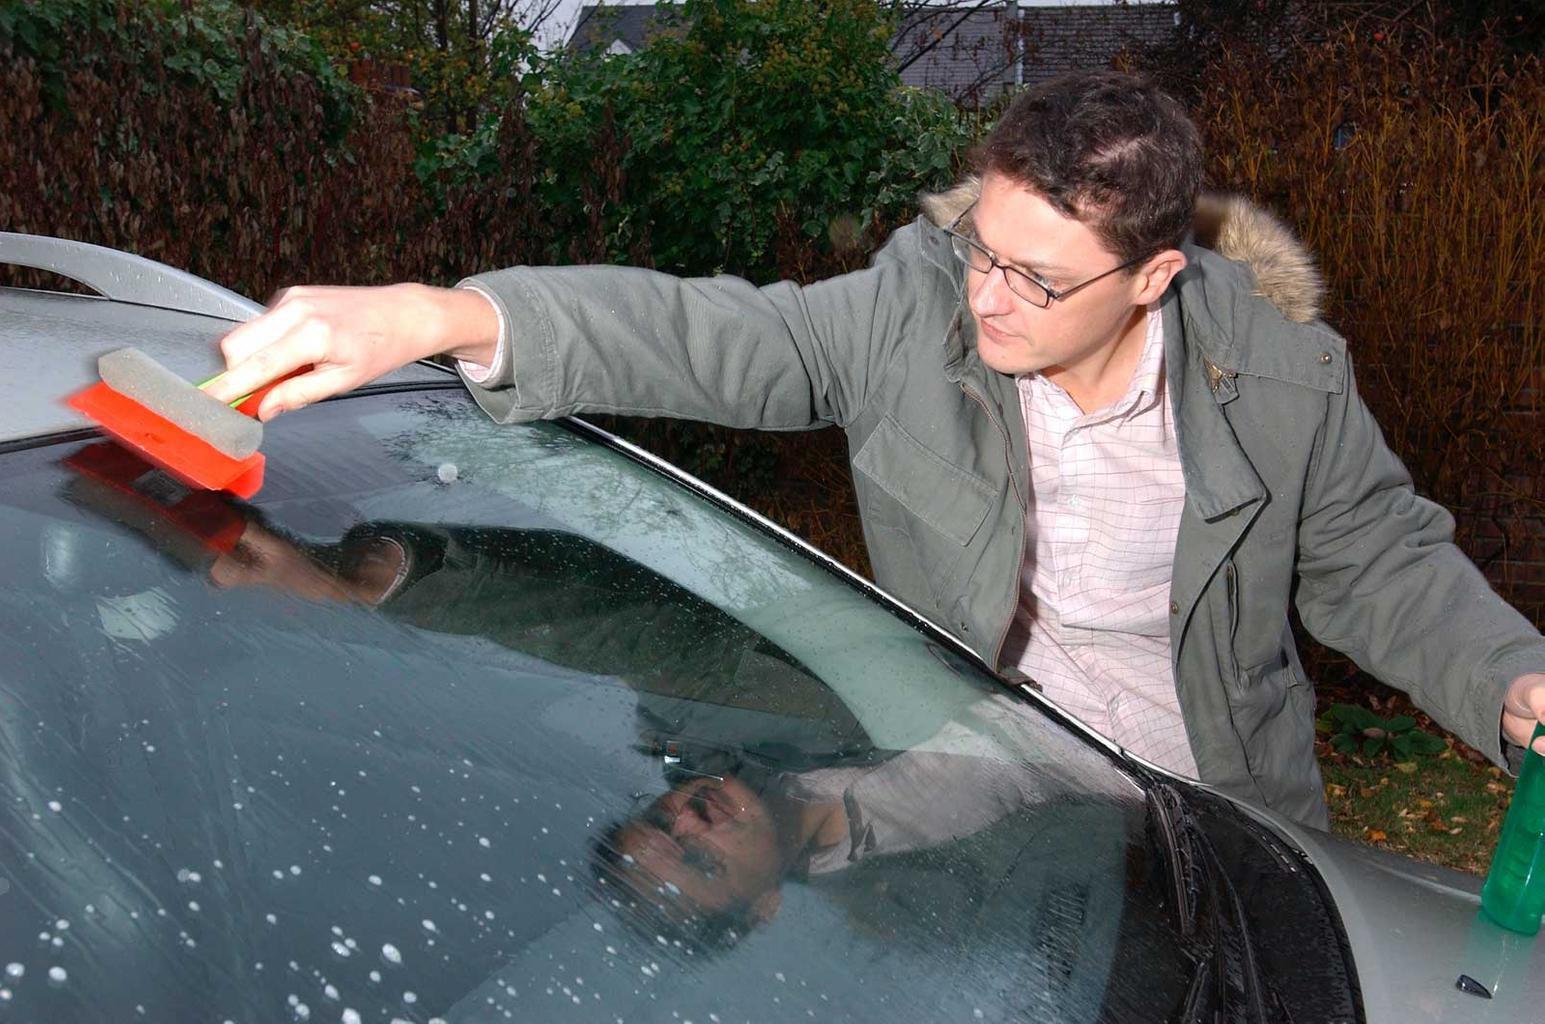 De-icer and a scraper on windscreen